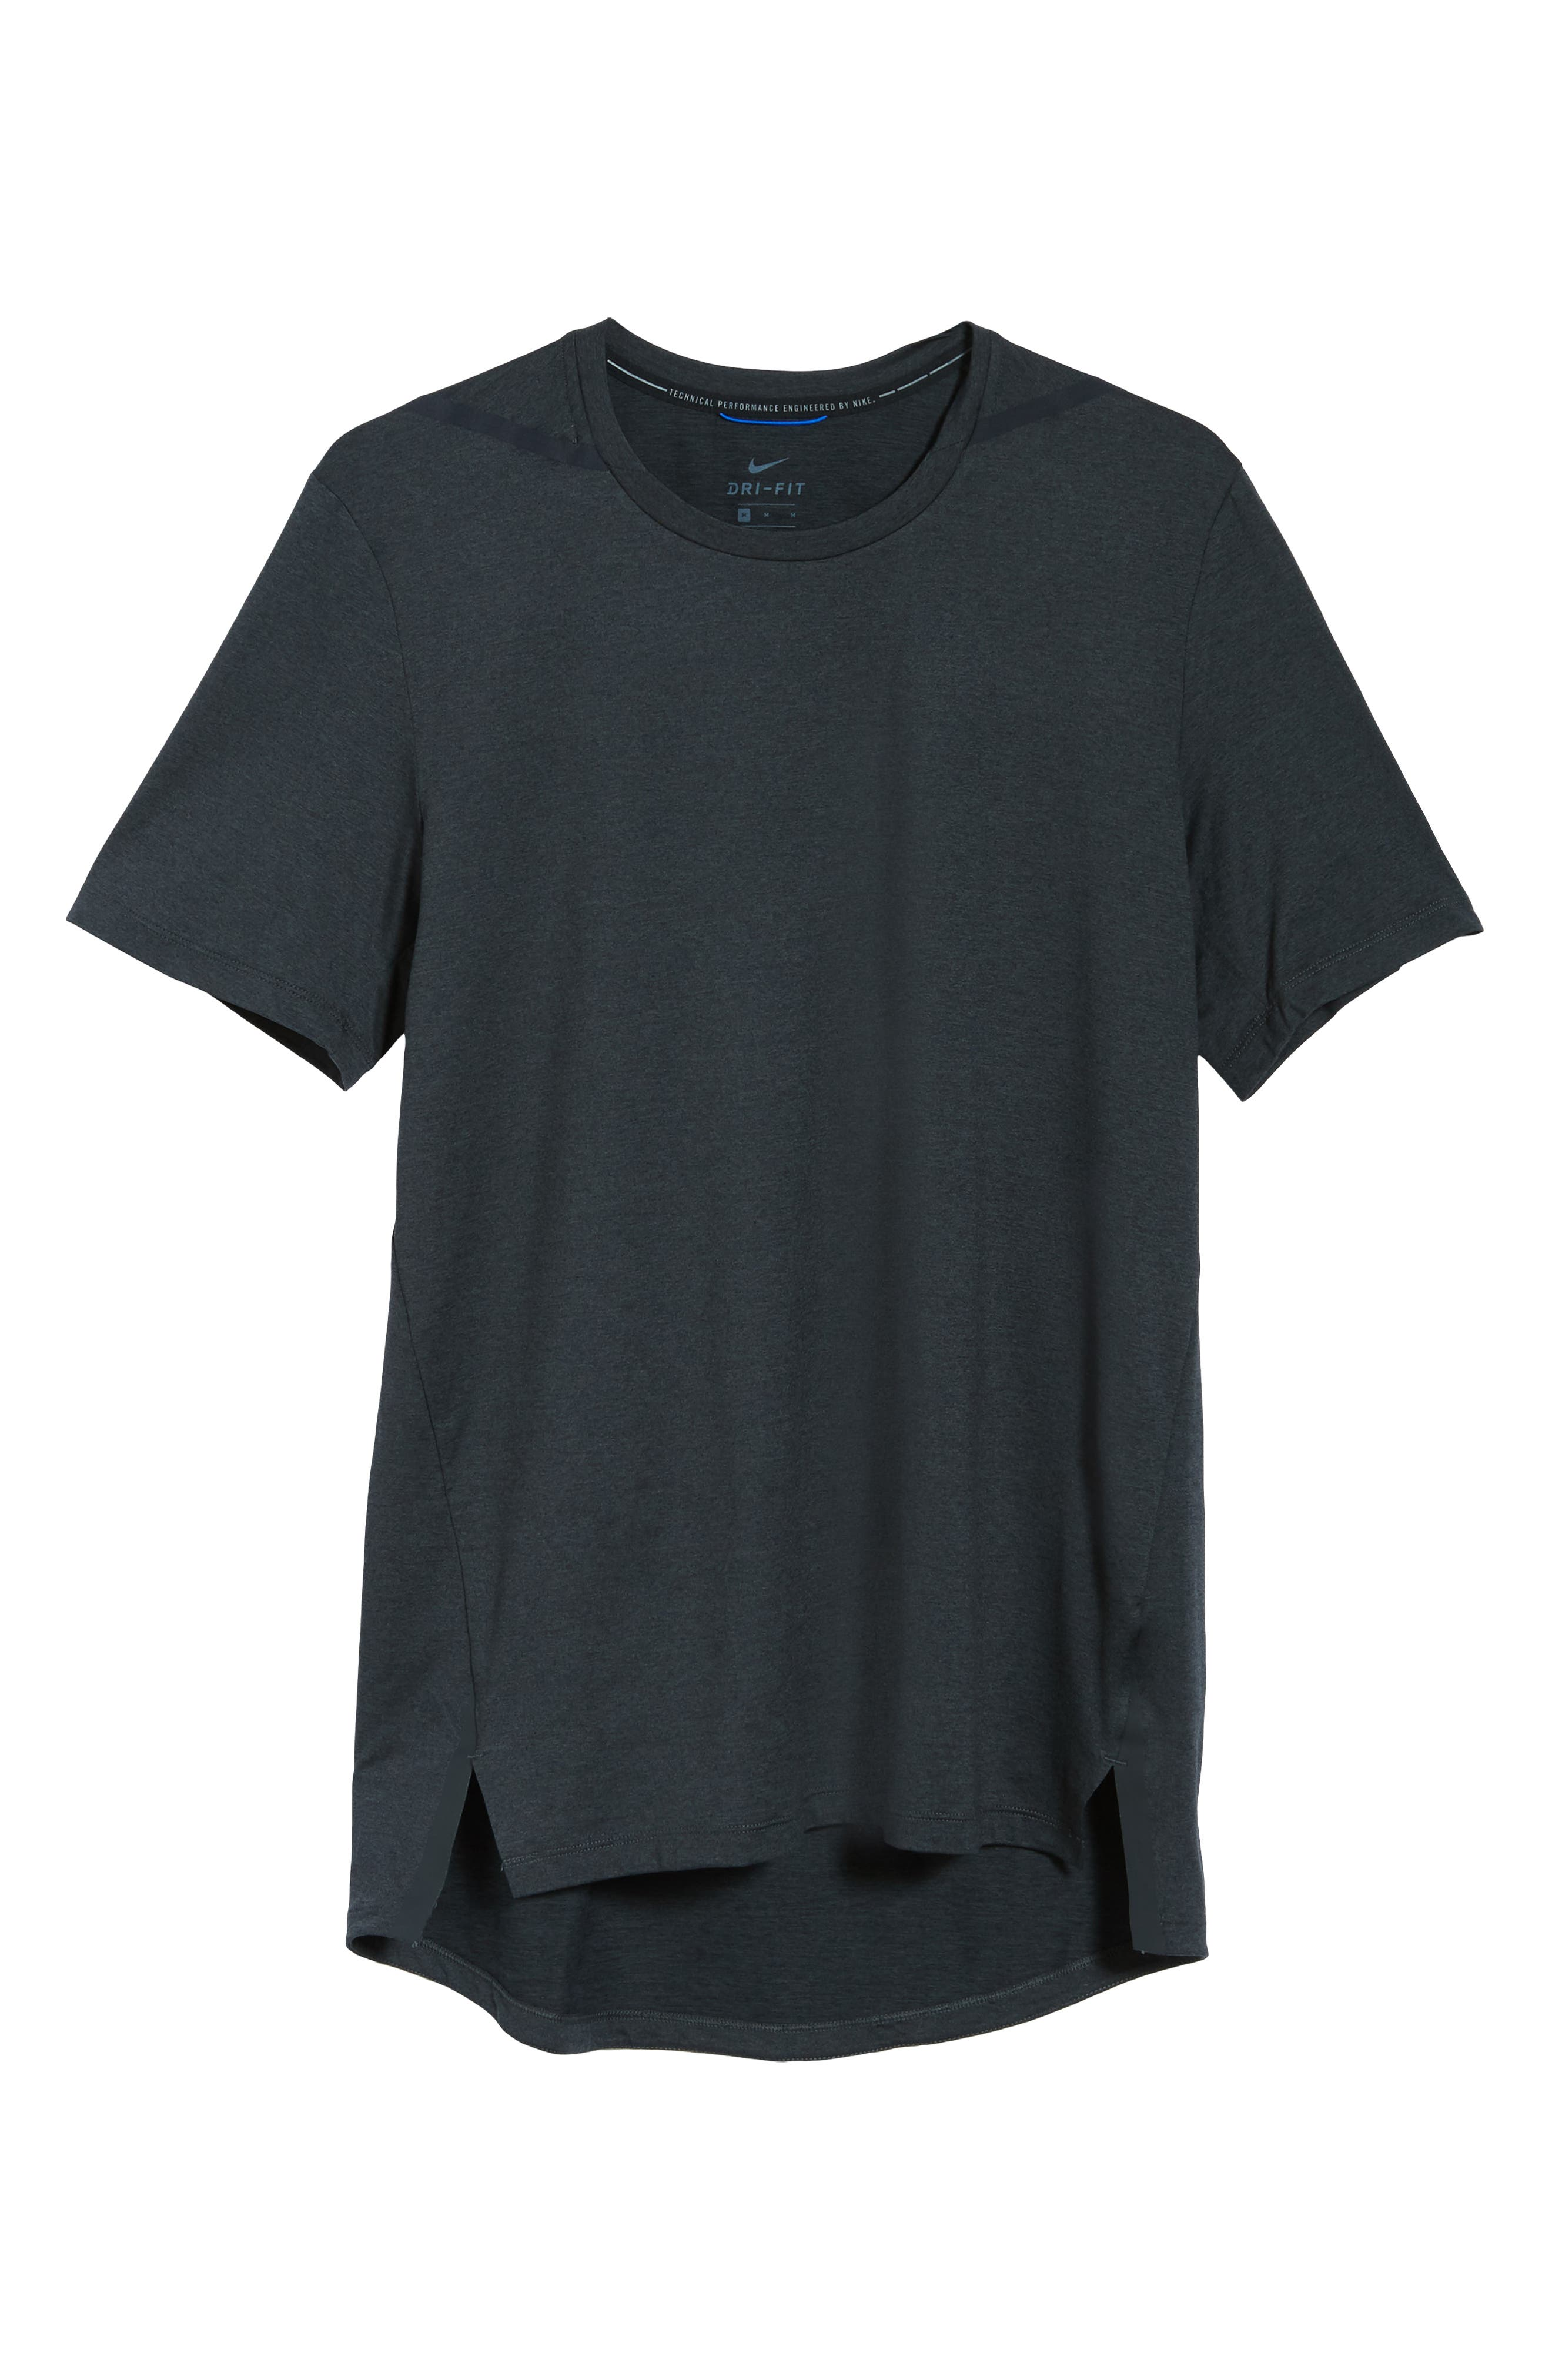 Dry Max Training T-Shirt,                             Alternate thumbnail 6, color,                             BLACK/ ANTHRACITE/ COBALT